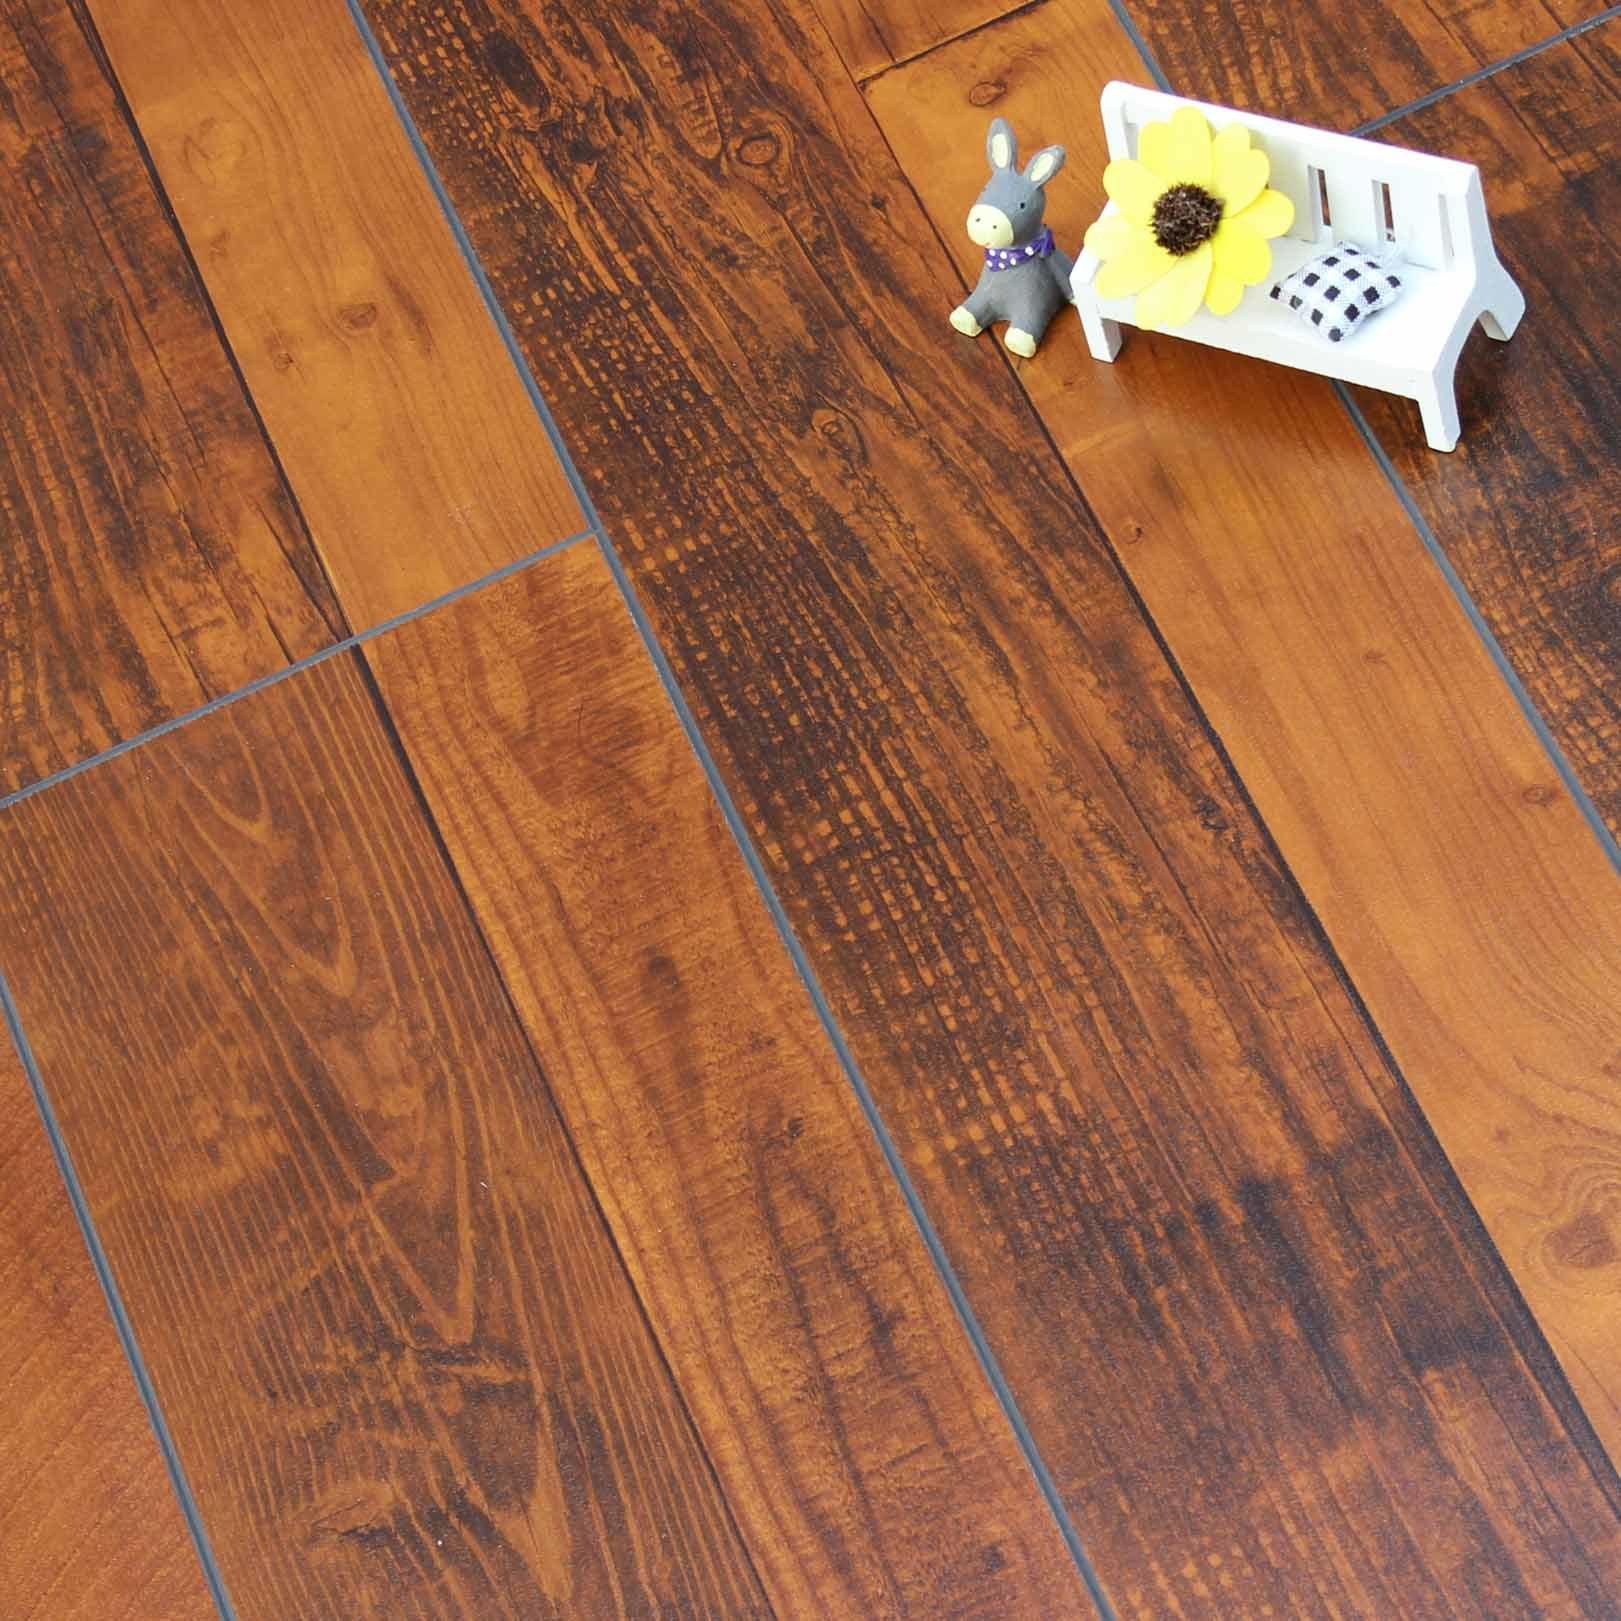 Design Modern Style Laminate Flooring AC3/ Laminate Parquet Flooring